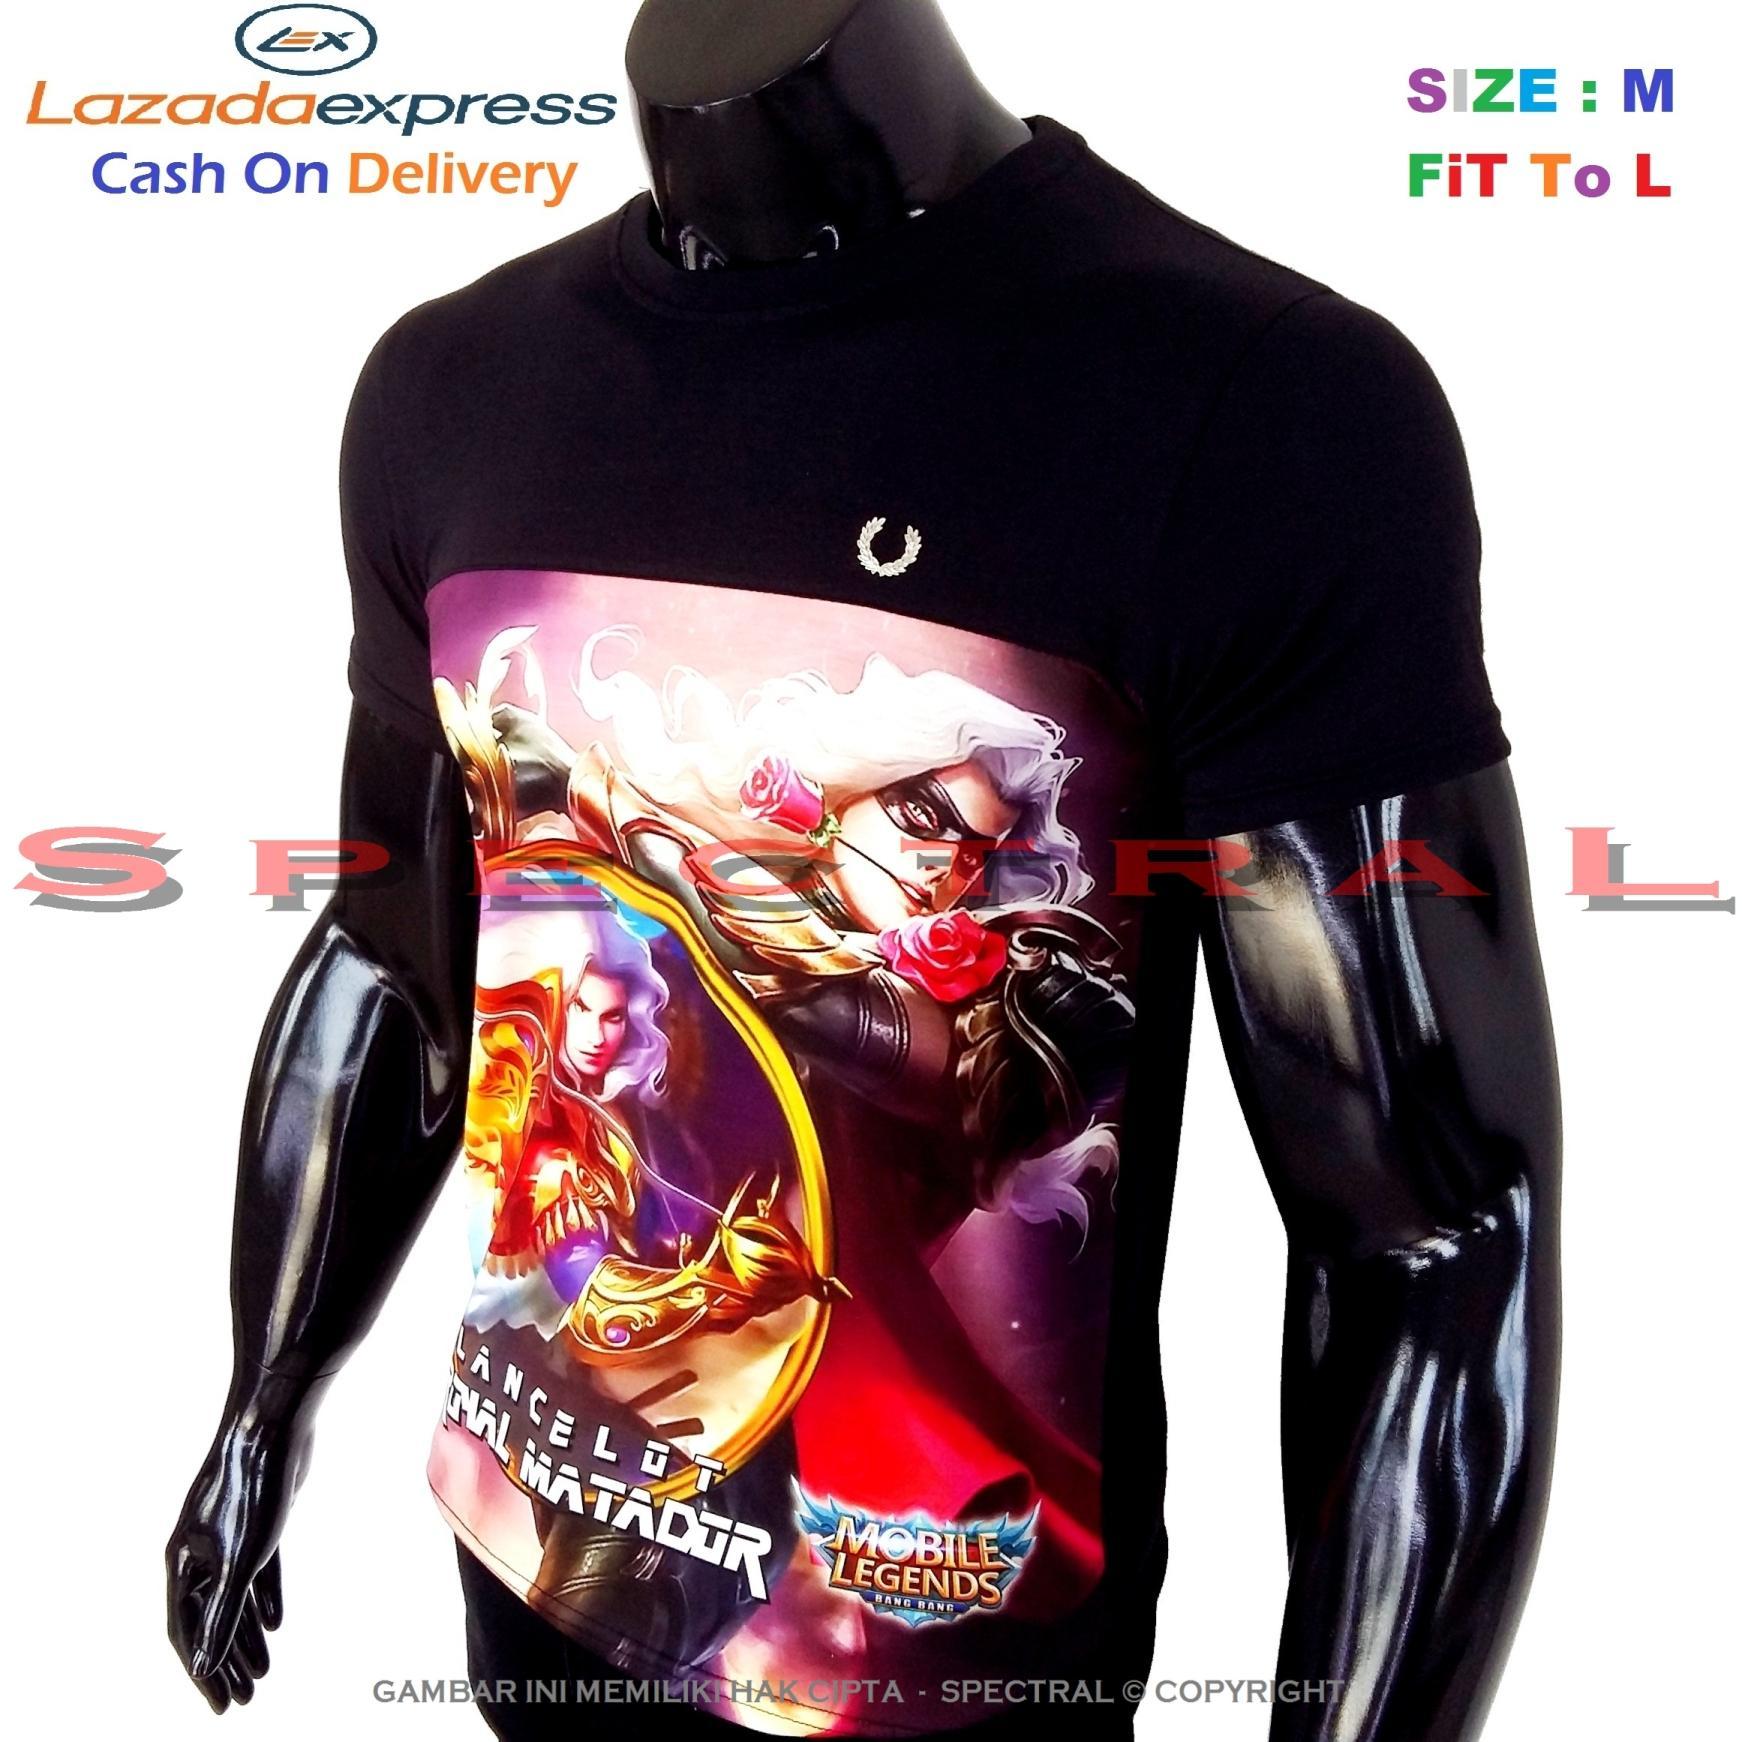 Spectral – 3D LANCELOT Mobile Legend Kualitas HD Printing Size M Fit To L Soft Rayon Kaos Distro Fashion T-Shirt Atasan Baju Pakaian Polos Pria Wanita Cewe Cowo Lengan Murah Bagus Keren Jaman Kekinian Jakarta Bandung Gambar Game Mobilelegend Legends